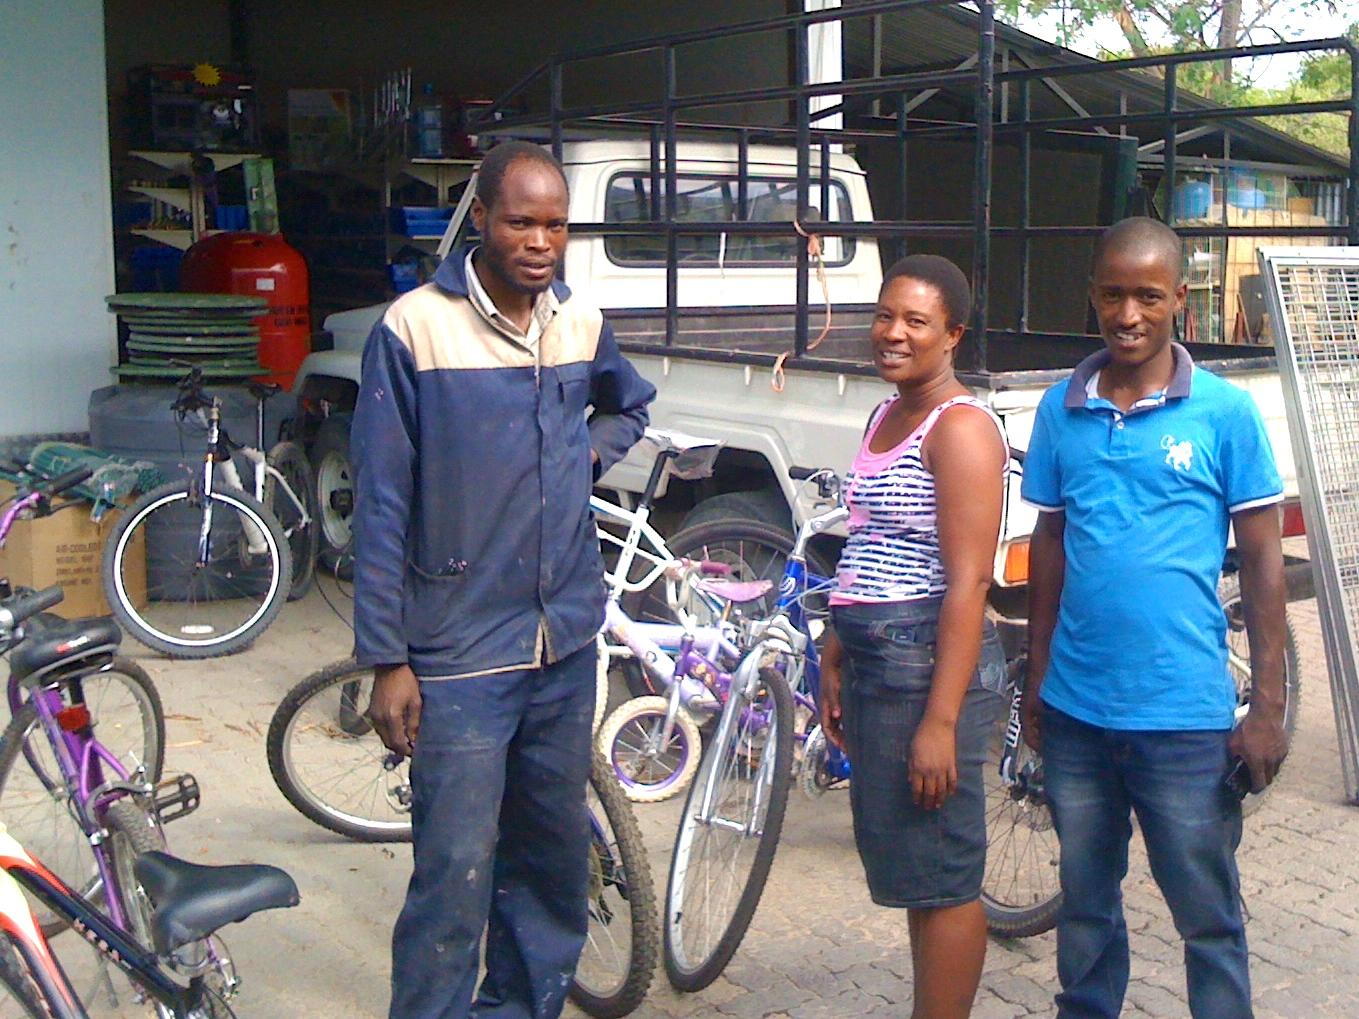 Hamo, Sparks and Girlie at the Bike Shop Maun.